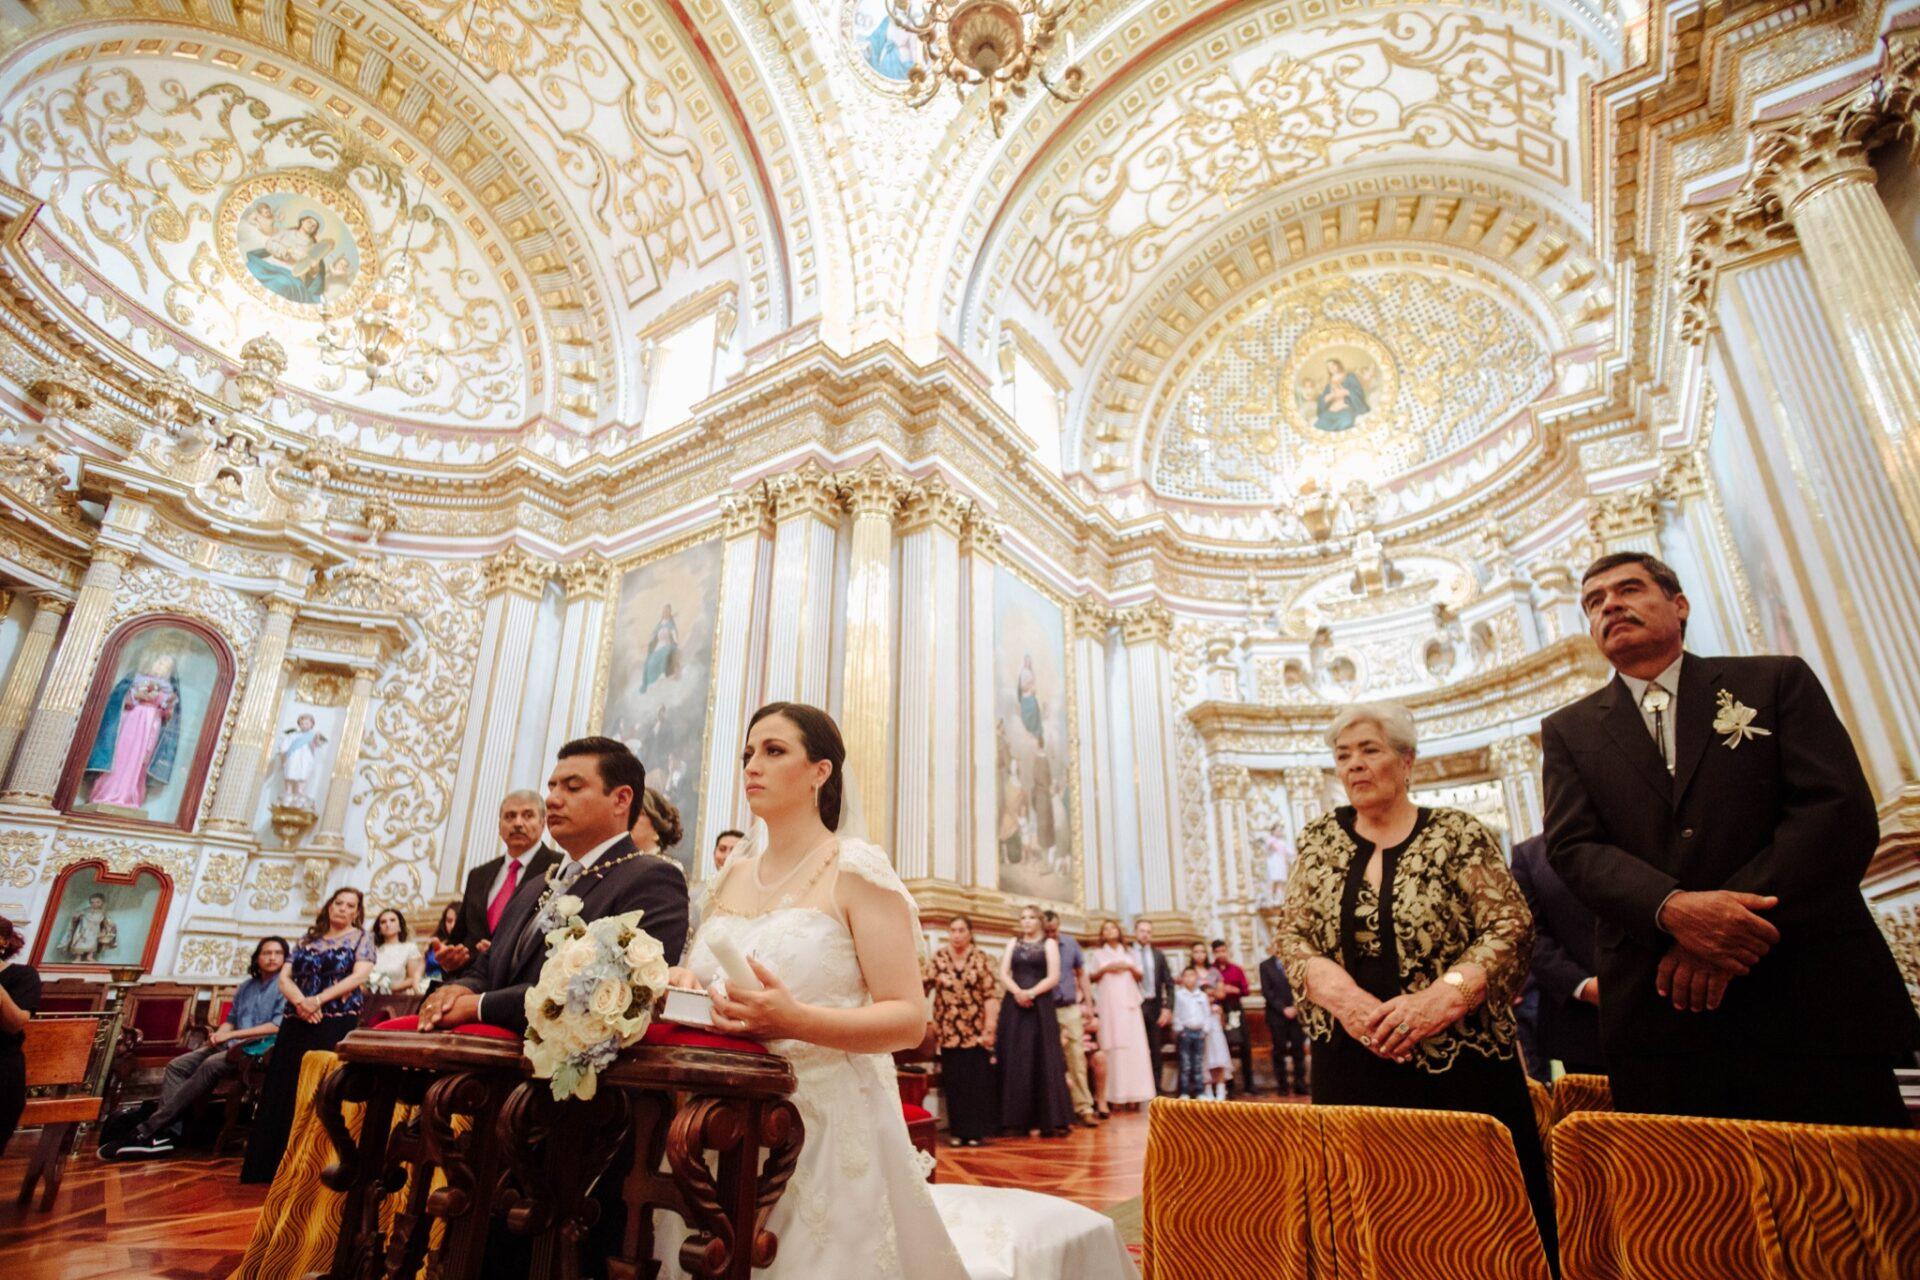 javier_noriega_fotografo_bodas_centro_platero_zacatecas_wedding_photographer13